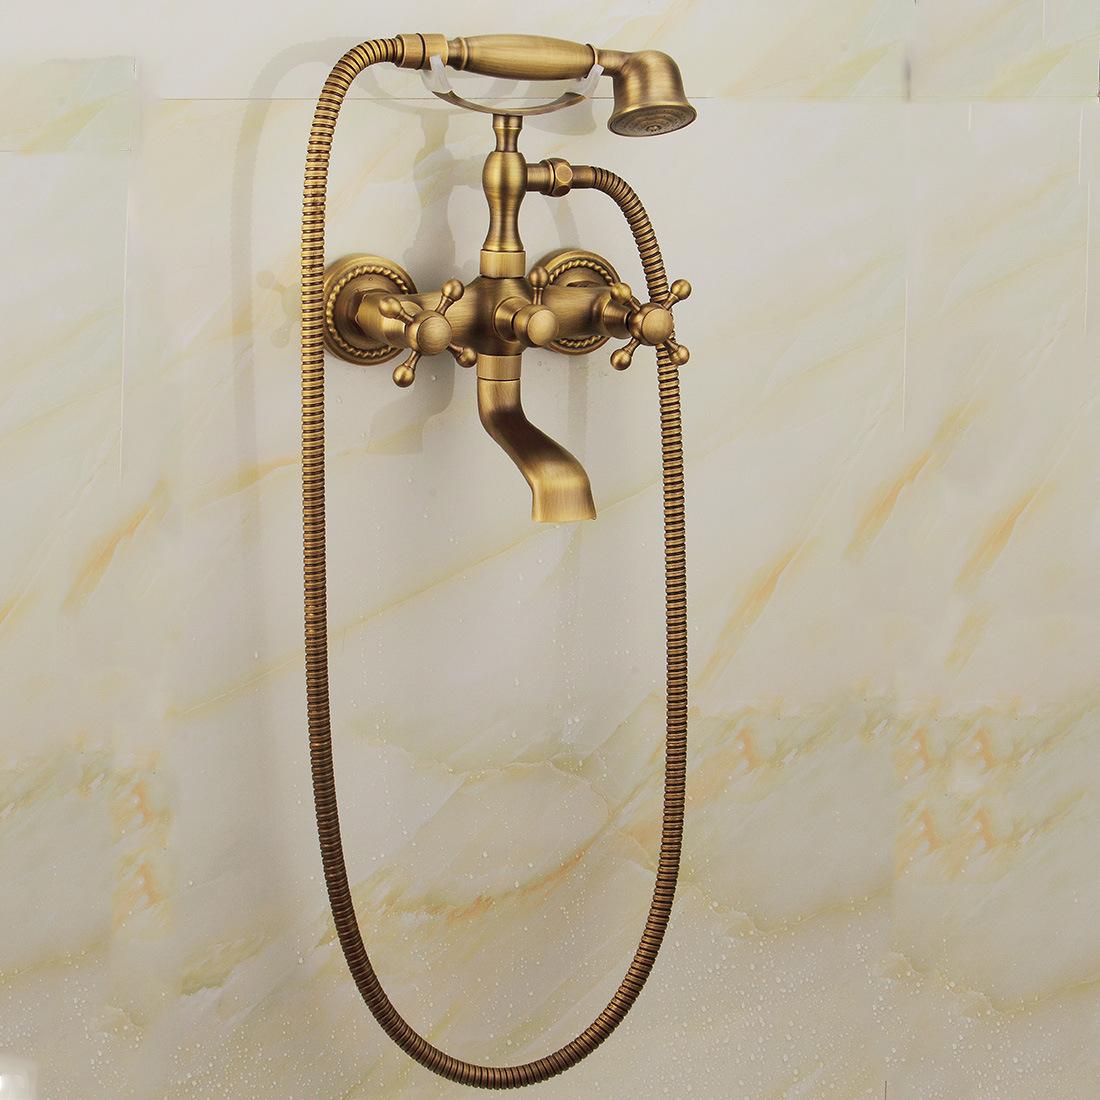 China FLG Antique Telephone Design Shower Set with Tap - China ...